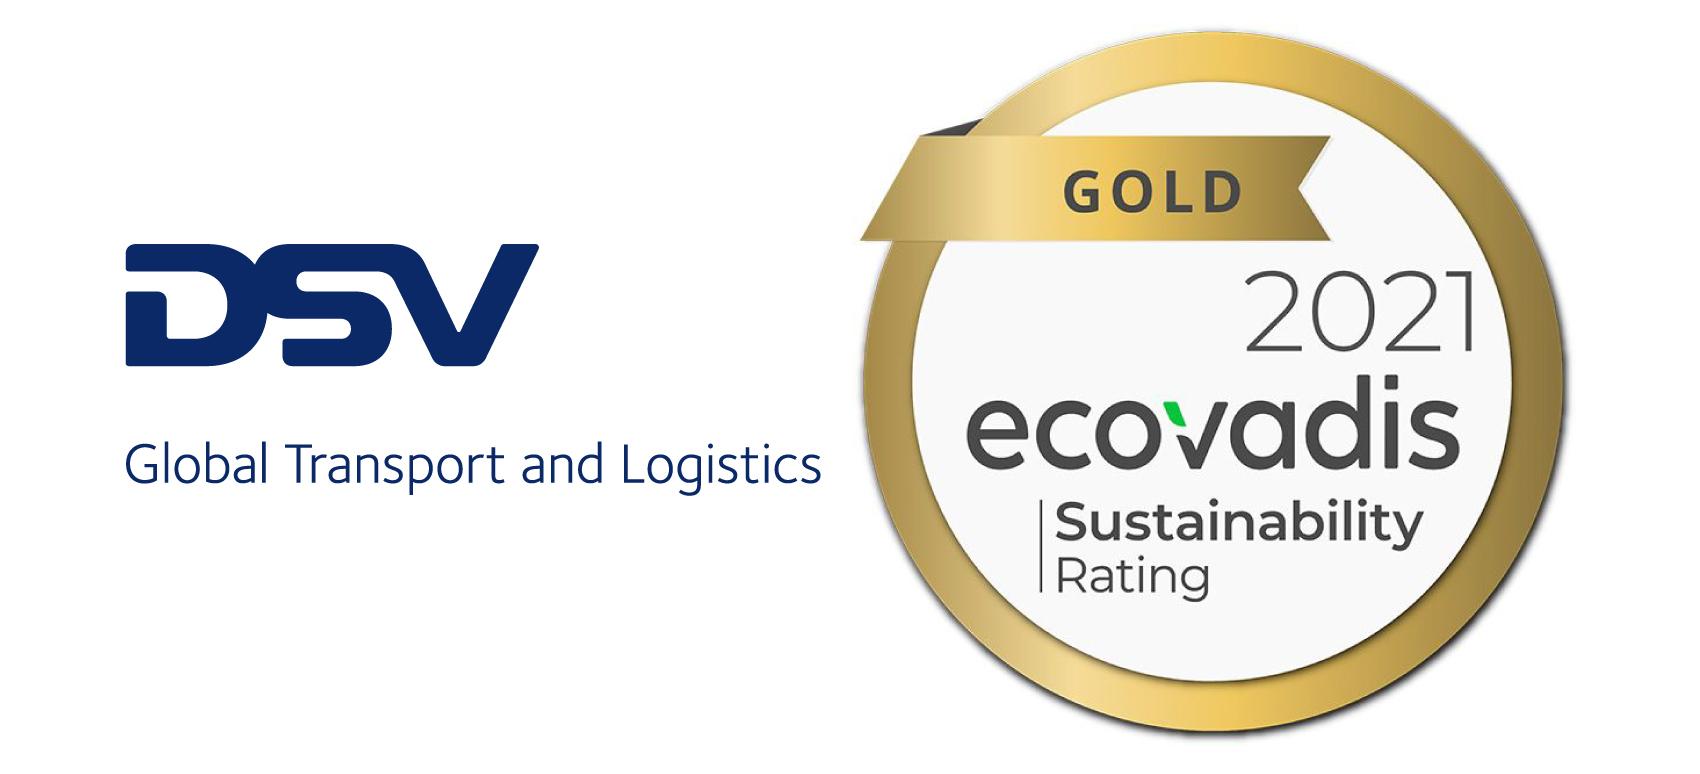 ecovadis gold rsc dsv